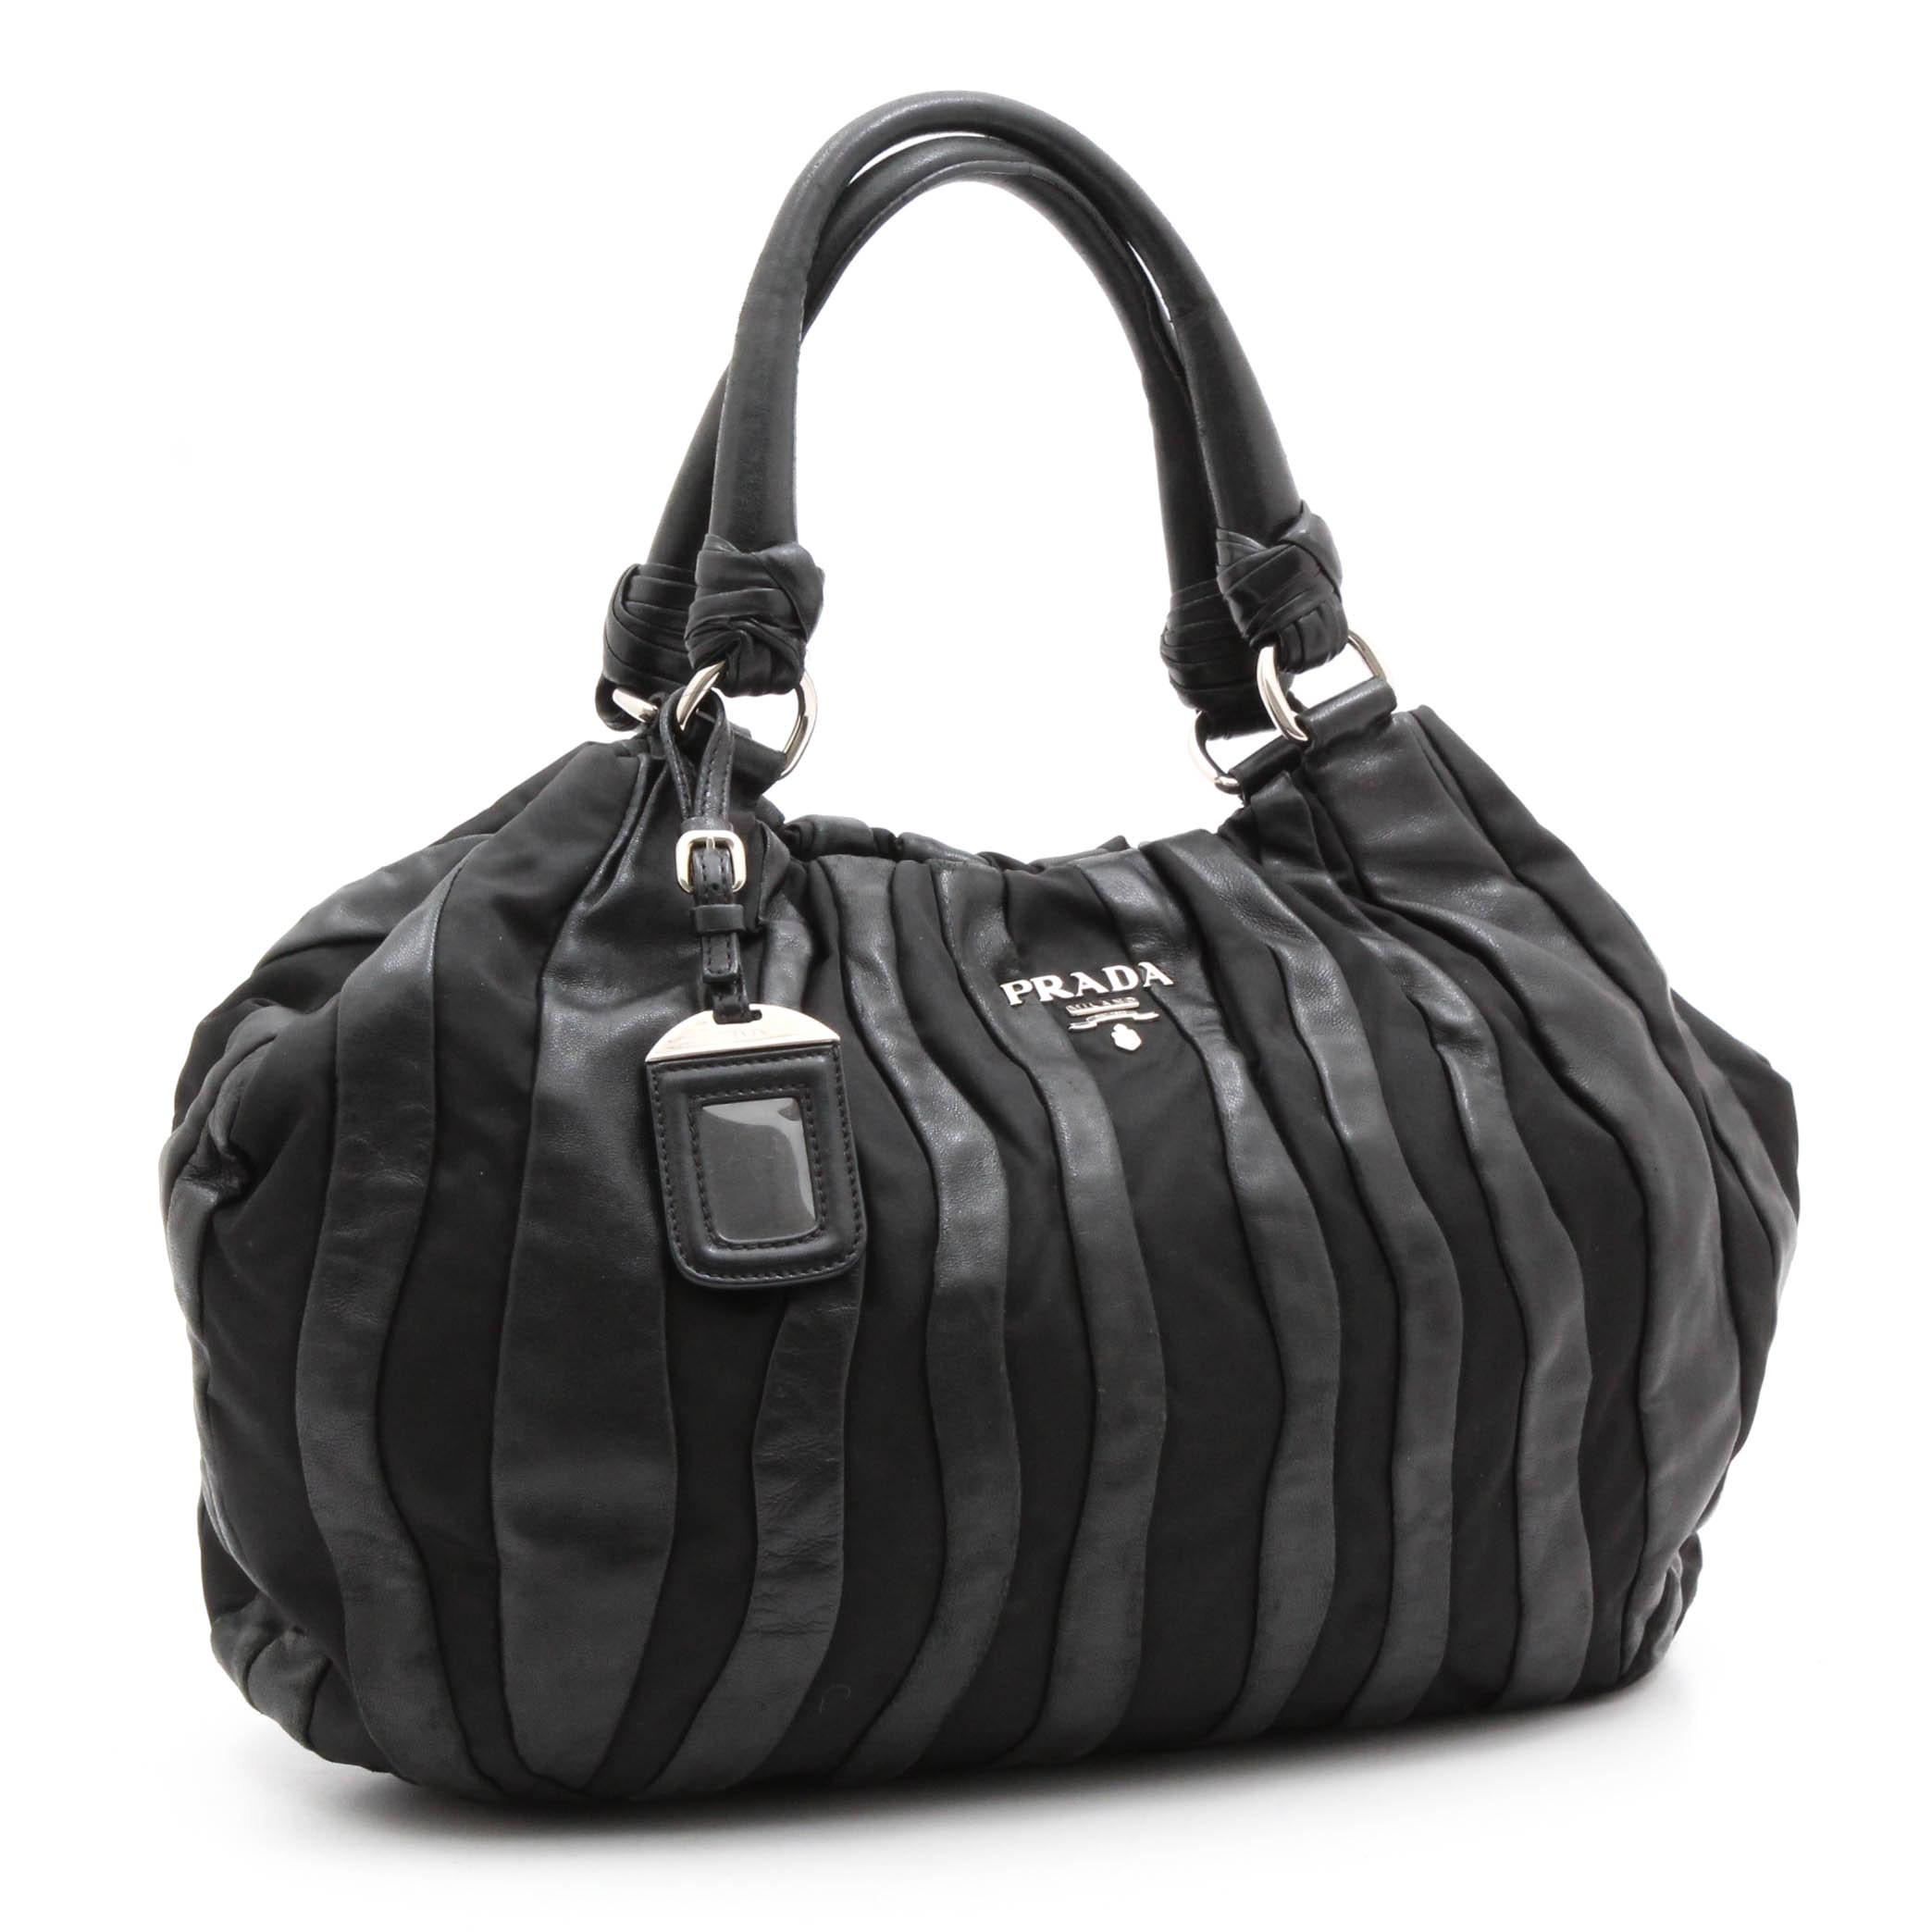 Prada Black Lambskin and Nylon Striped Hobo Bag